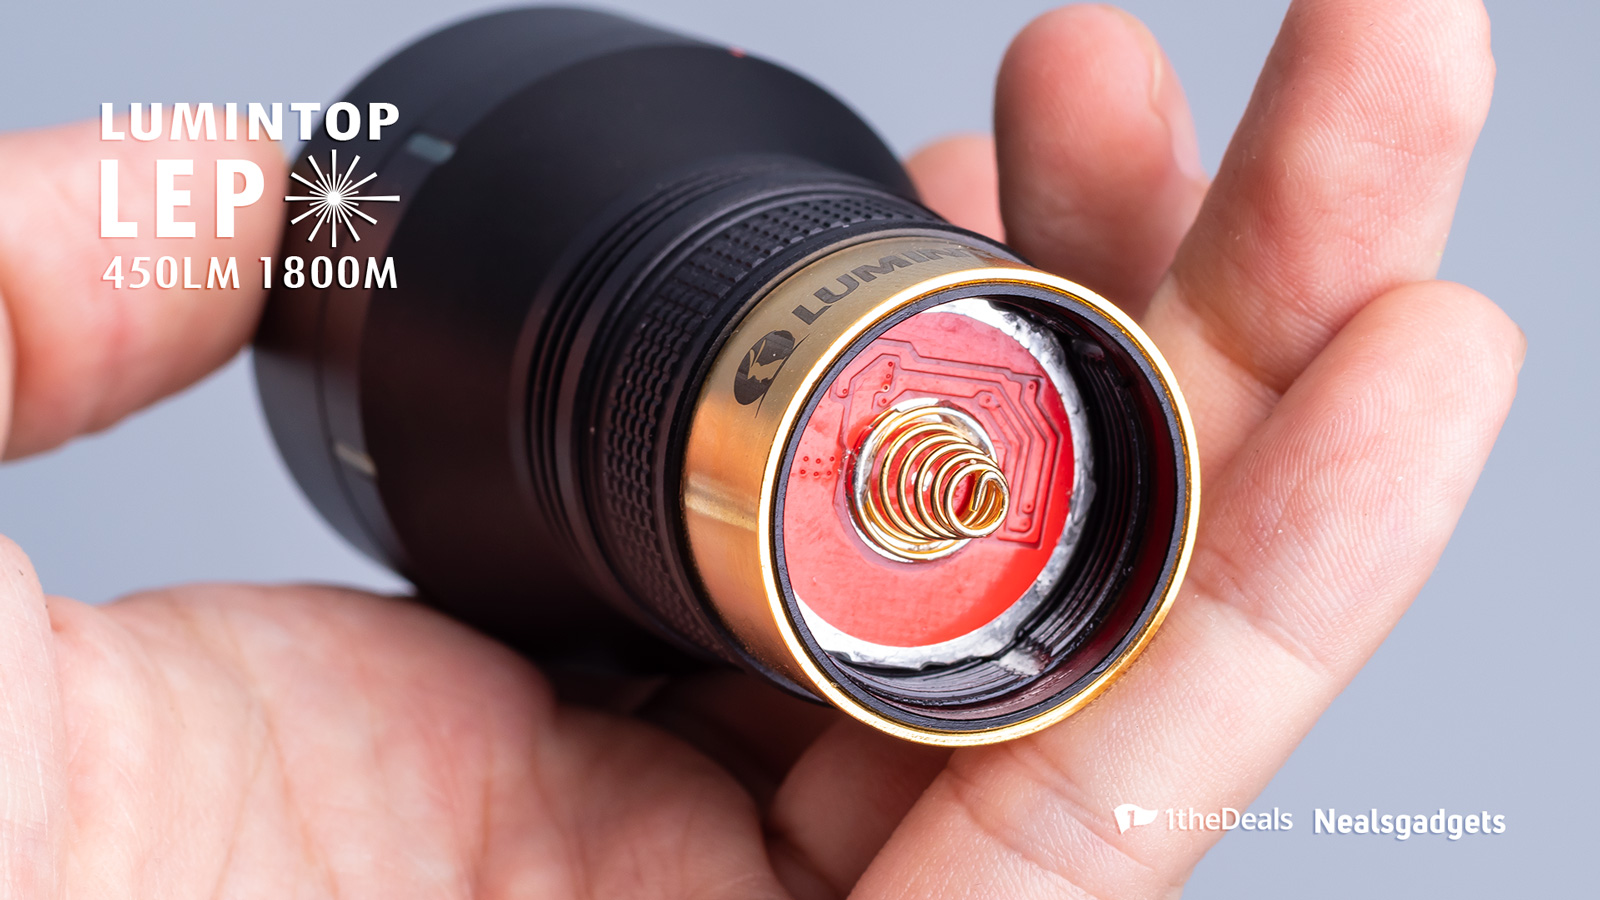 Lumintop LEP Prototype Image